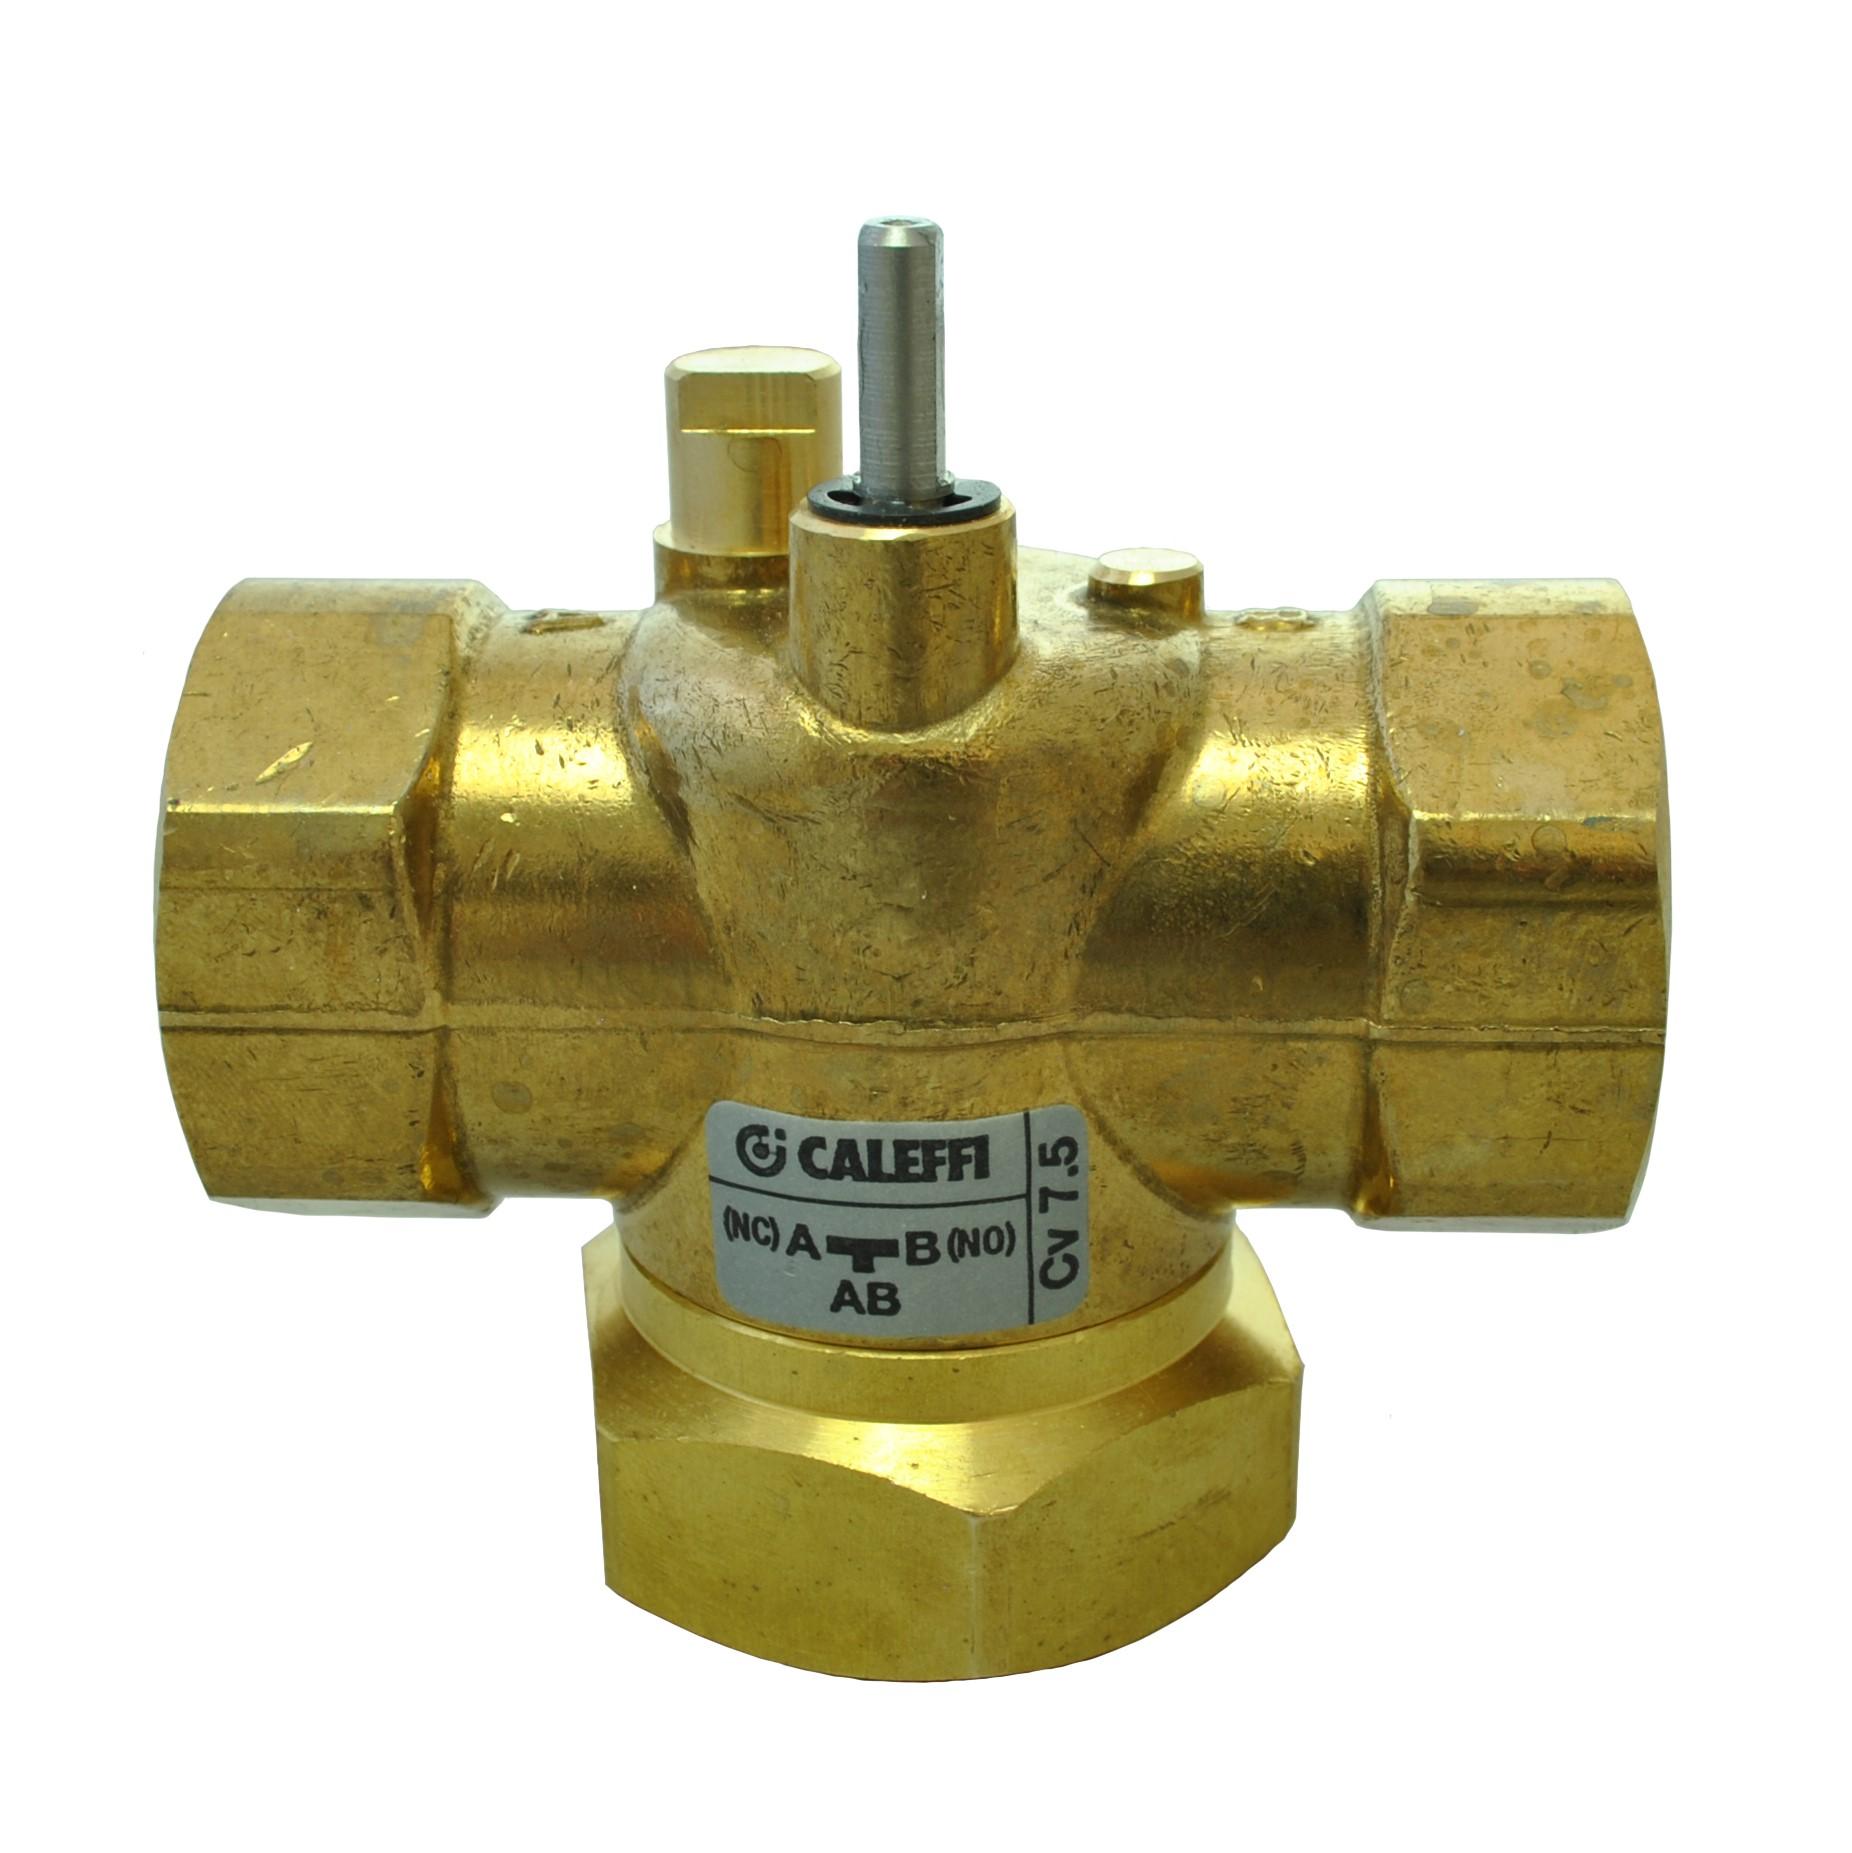 Caleffi Z-one 3 way valve